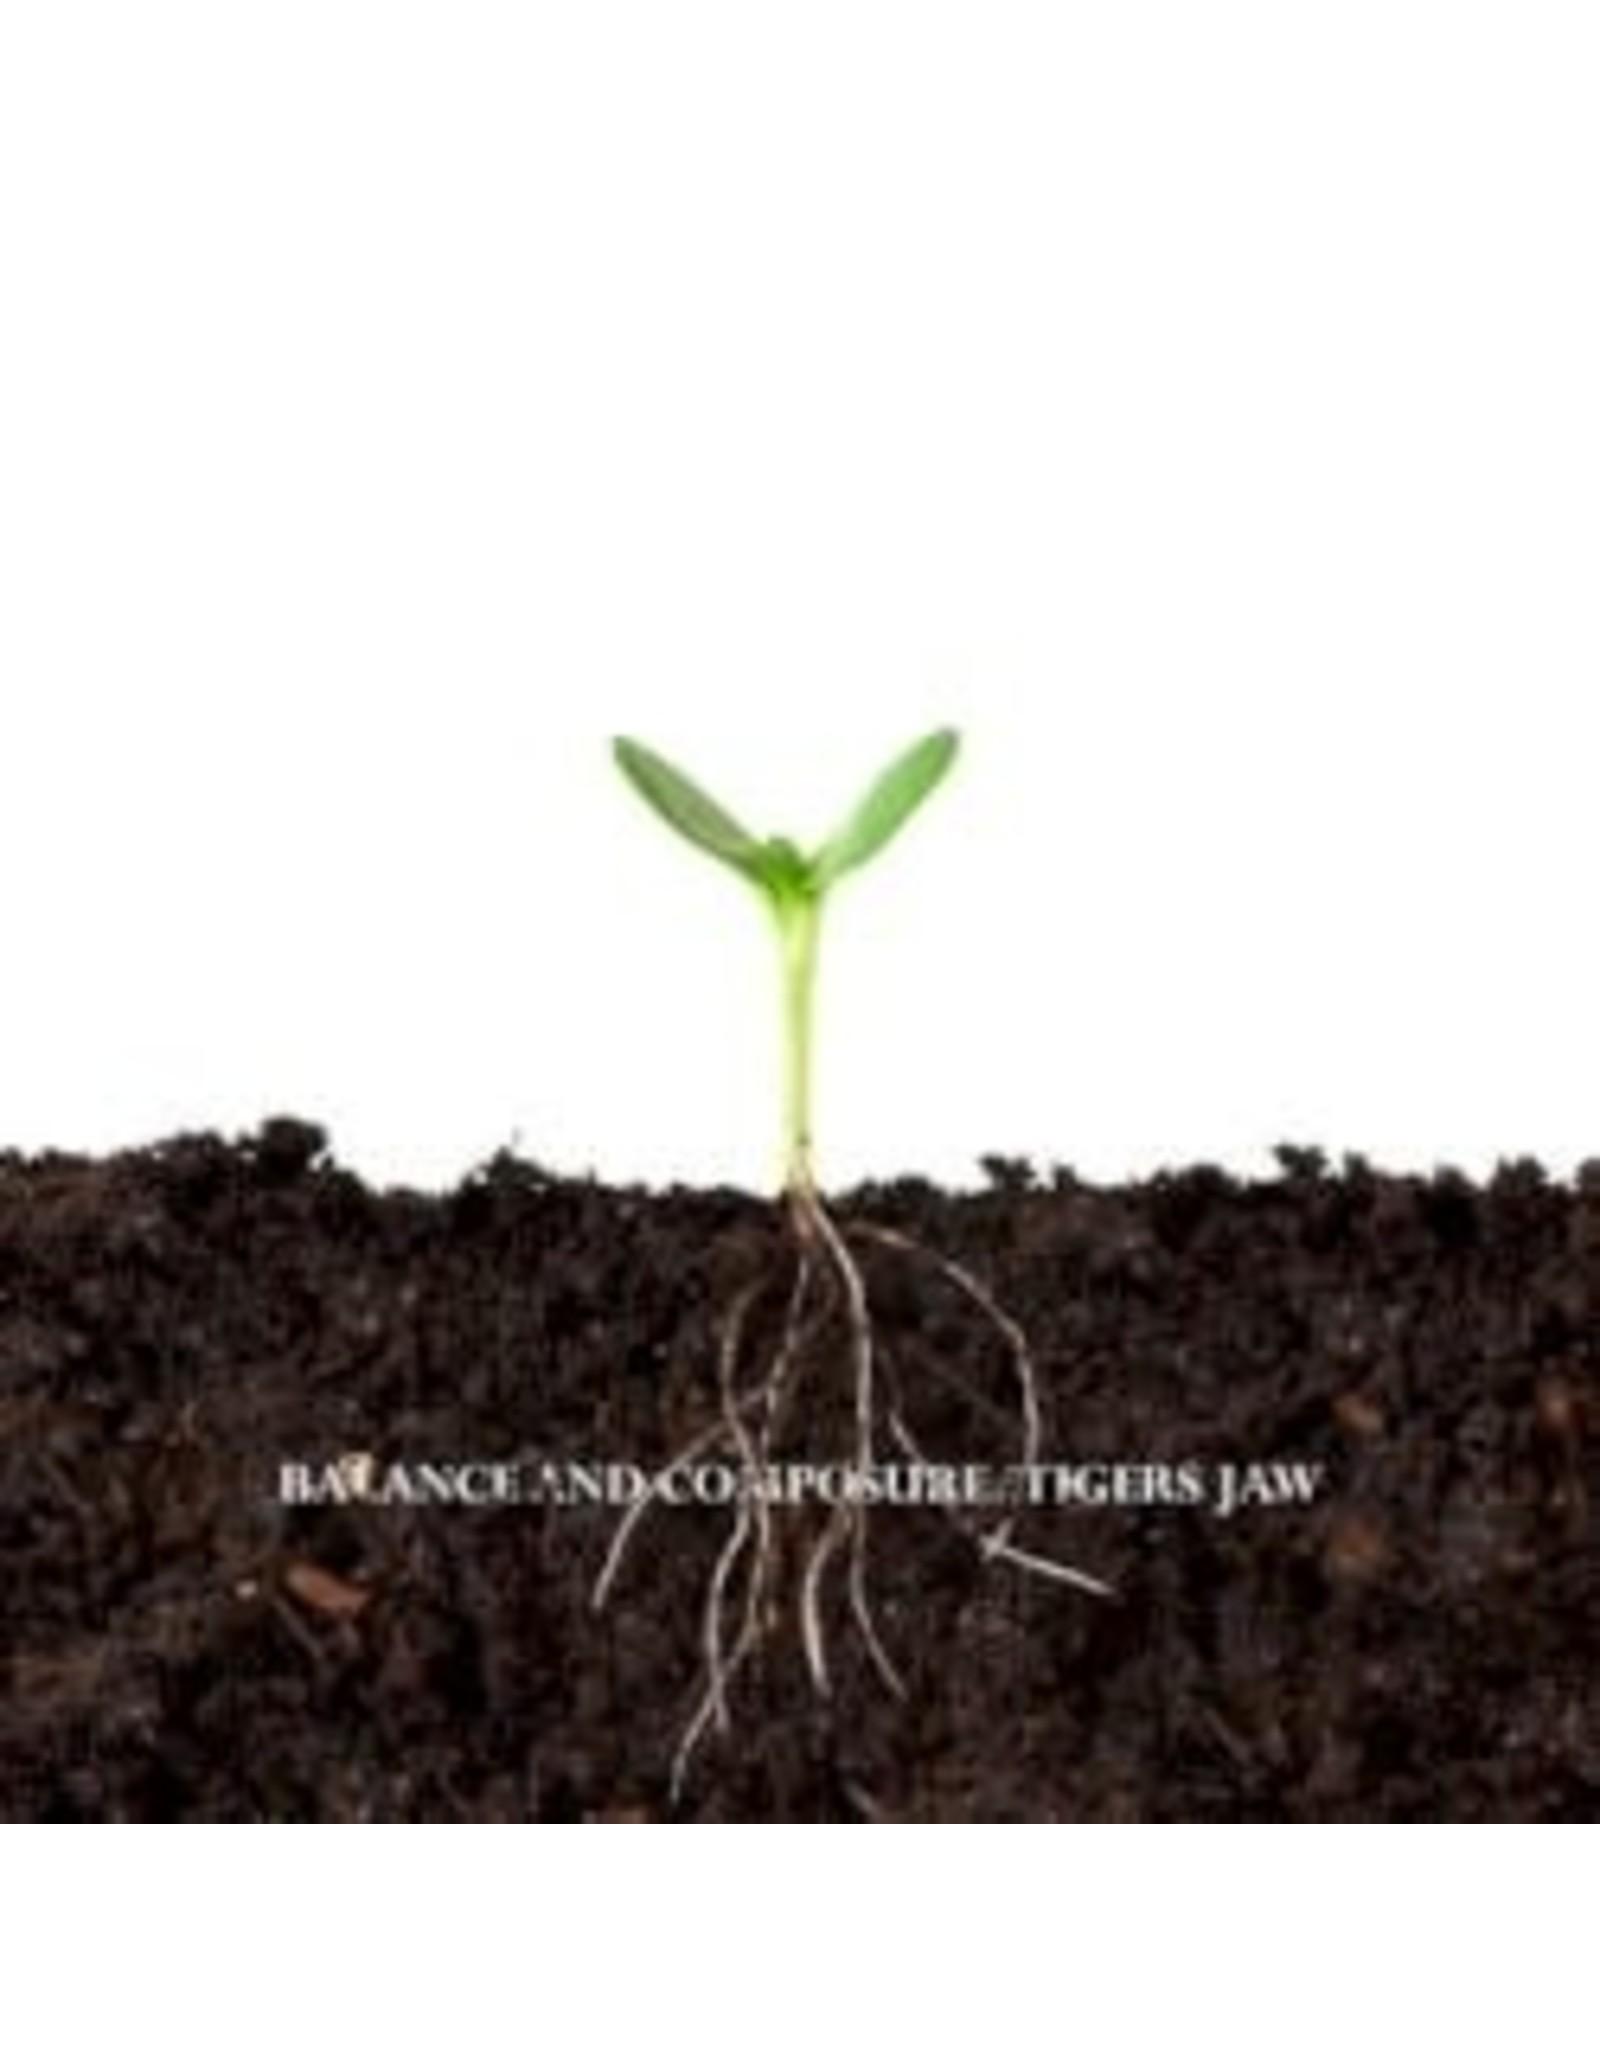 Tigers Jaw/Balance and Composure - Split LP